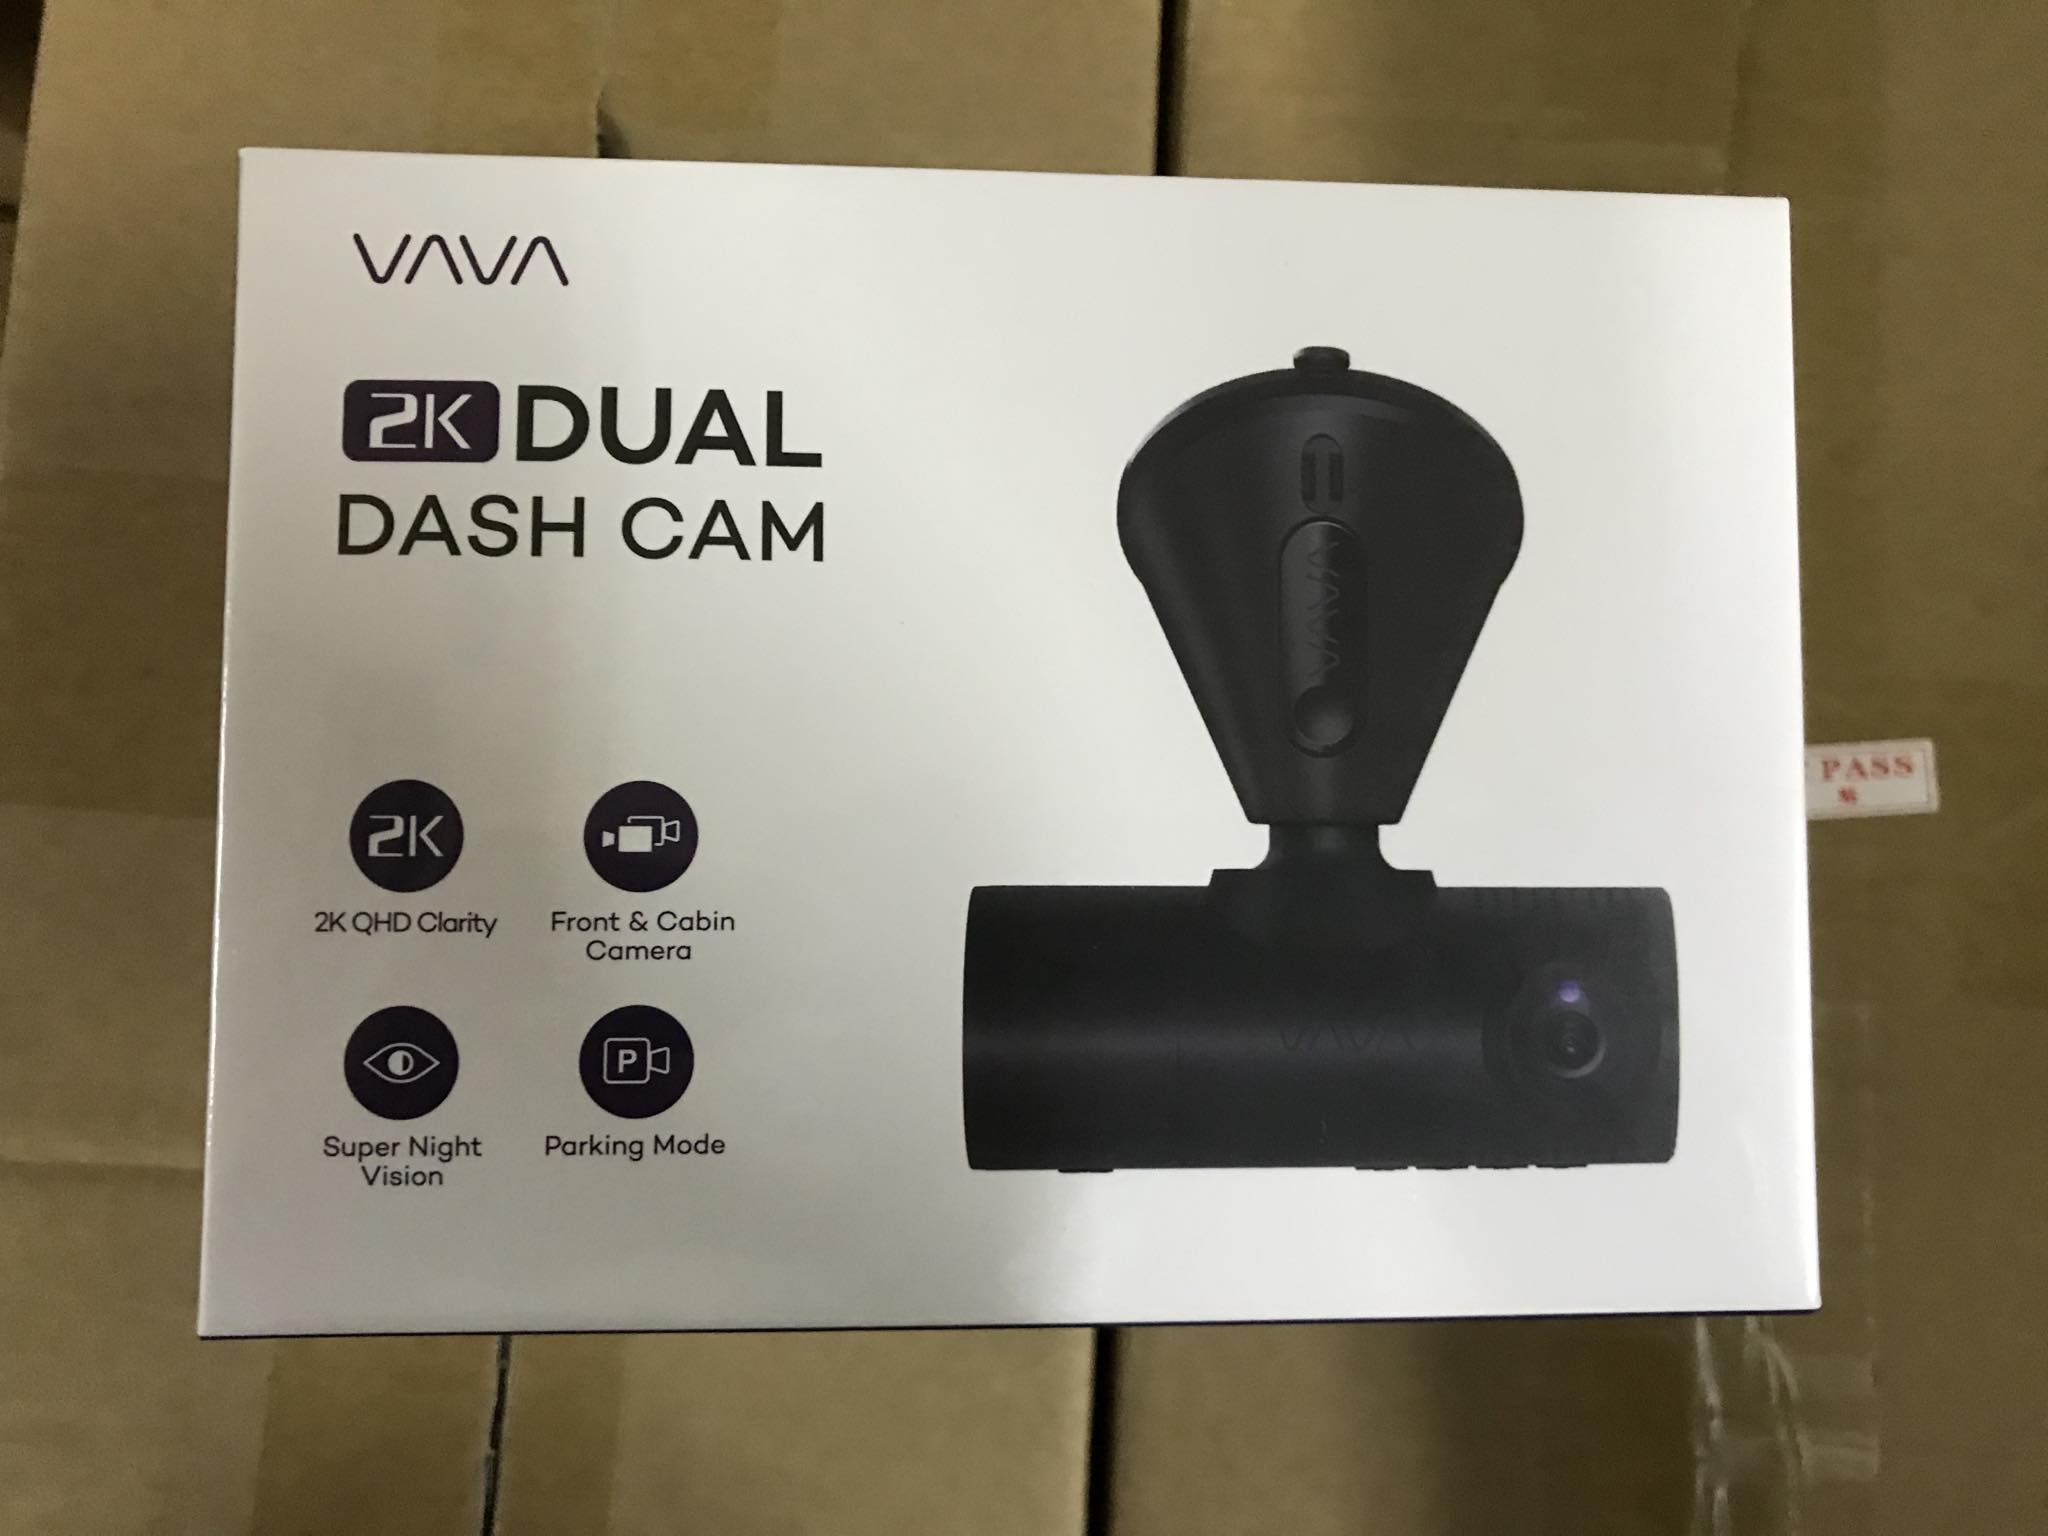 VAVA 2K Dash Cam